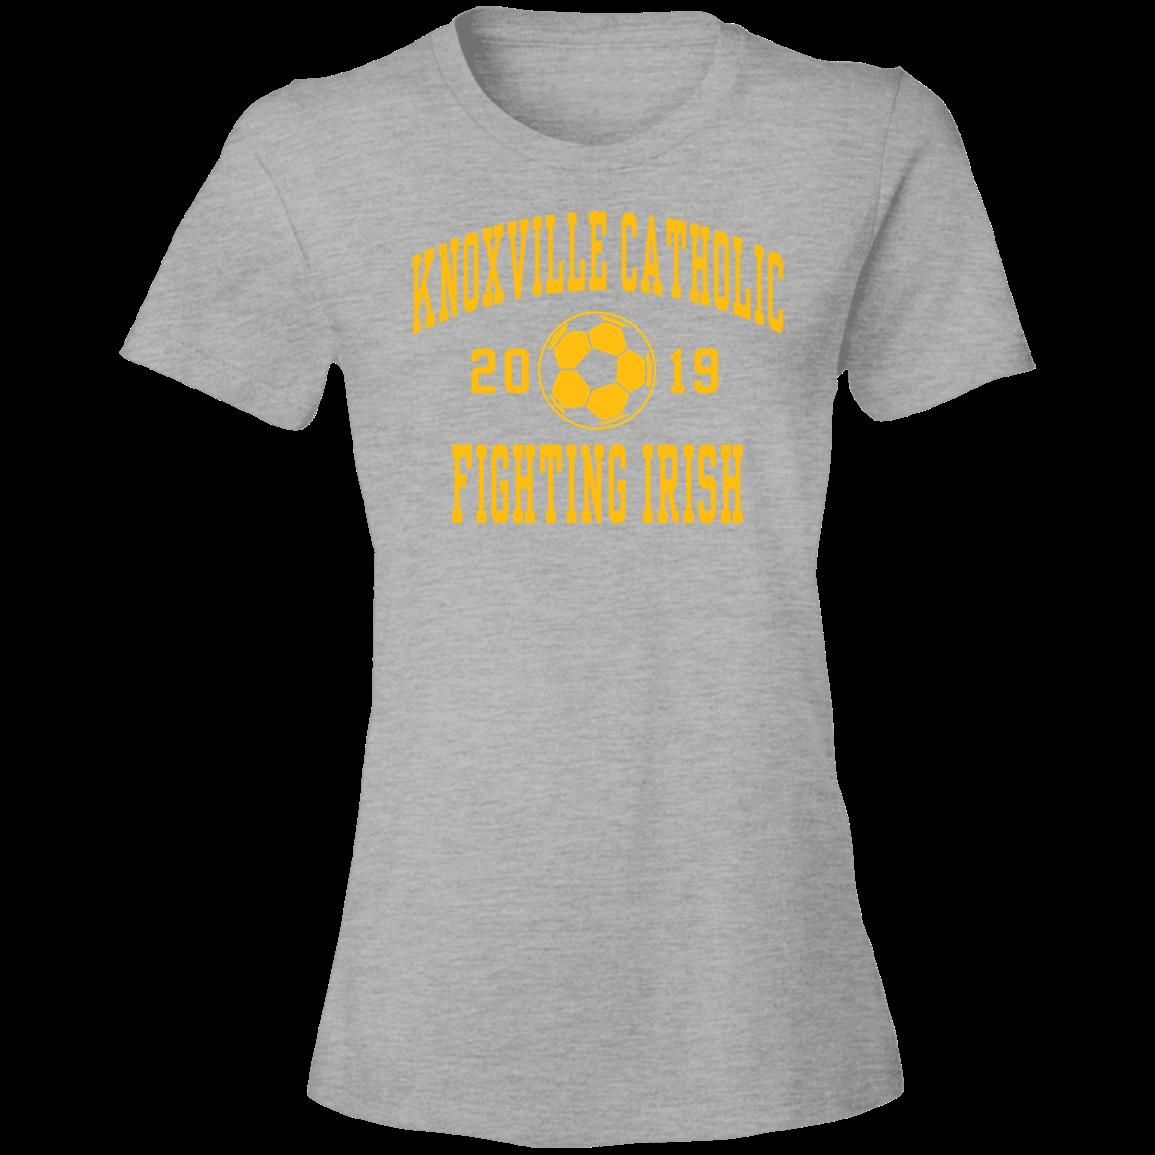 Knoxville Catholic High School Anvil Womens Lightweight Tshirt 45